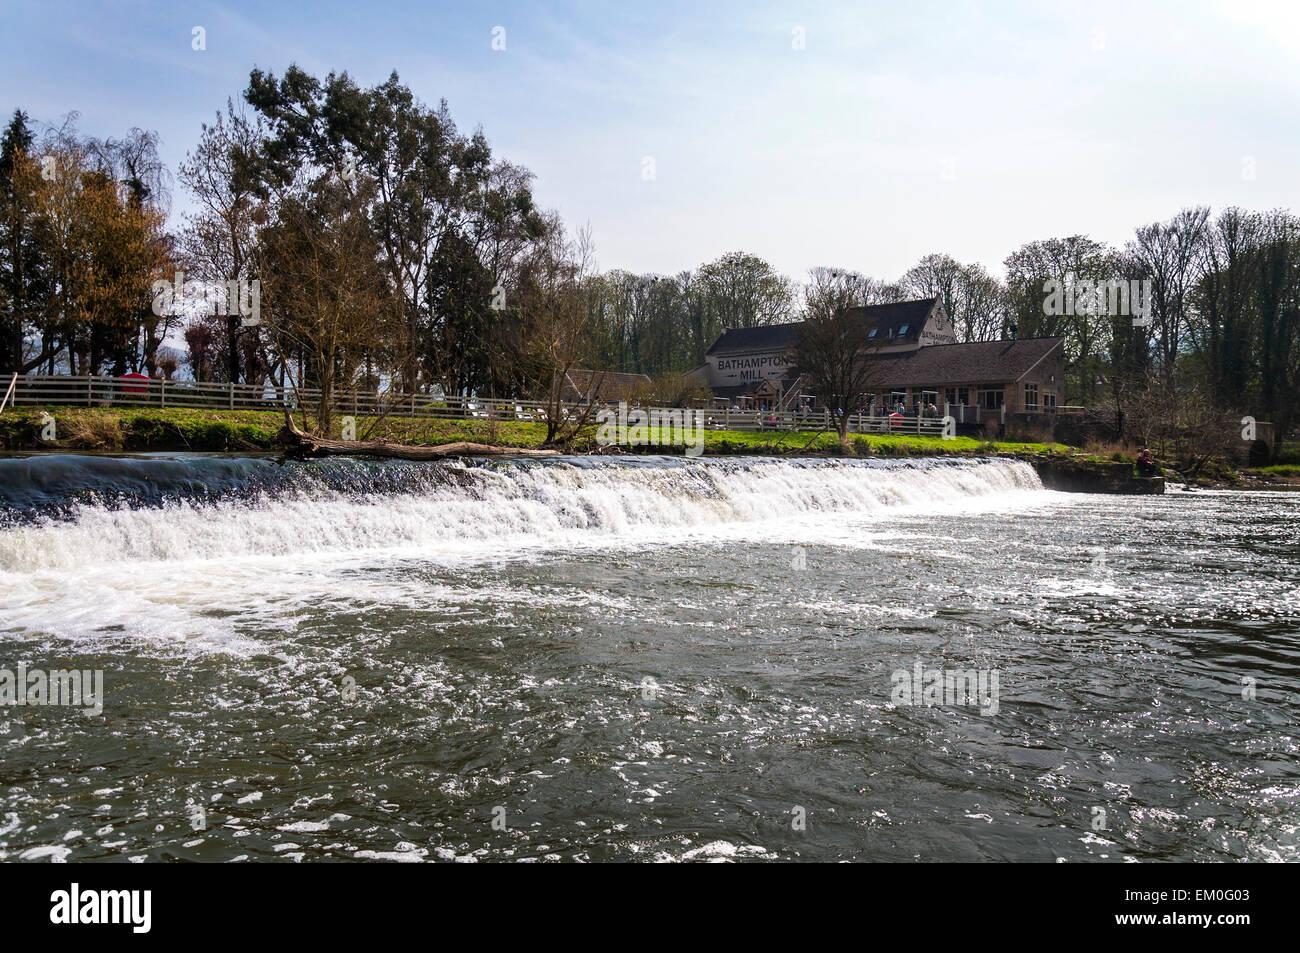 Bathampton Mill and weir on River Avon at Bathampton Stock Photo